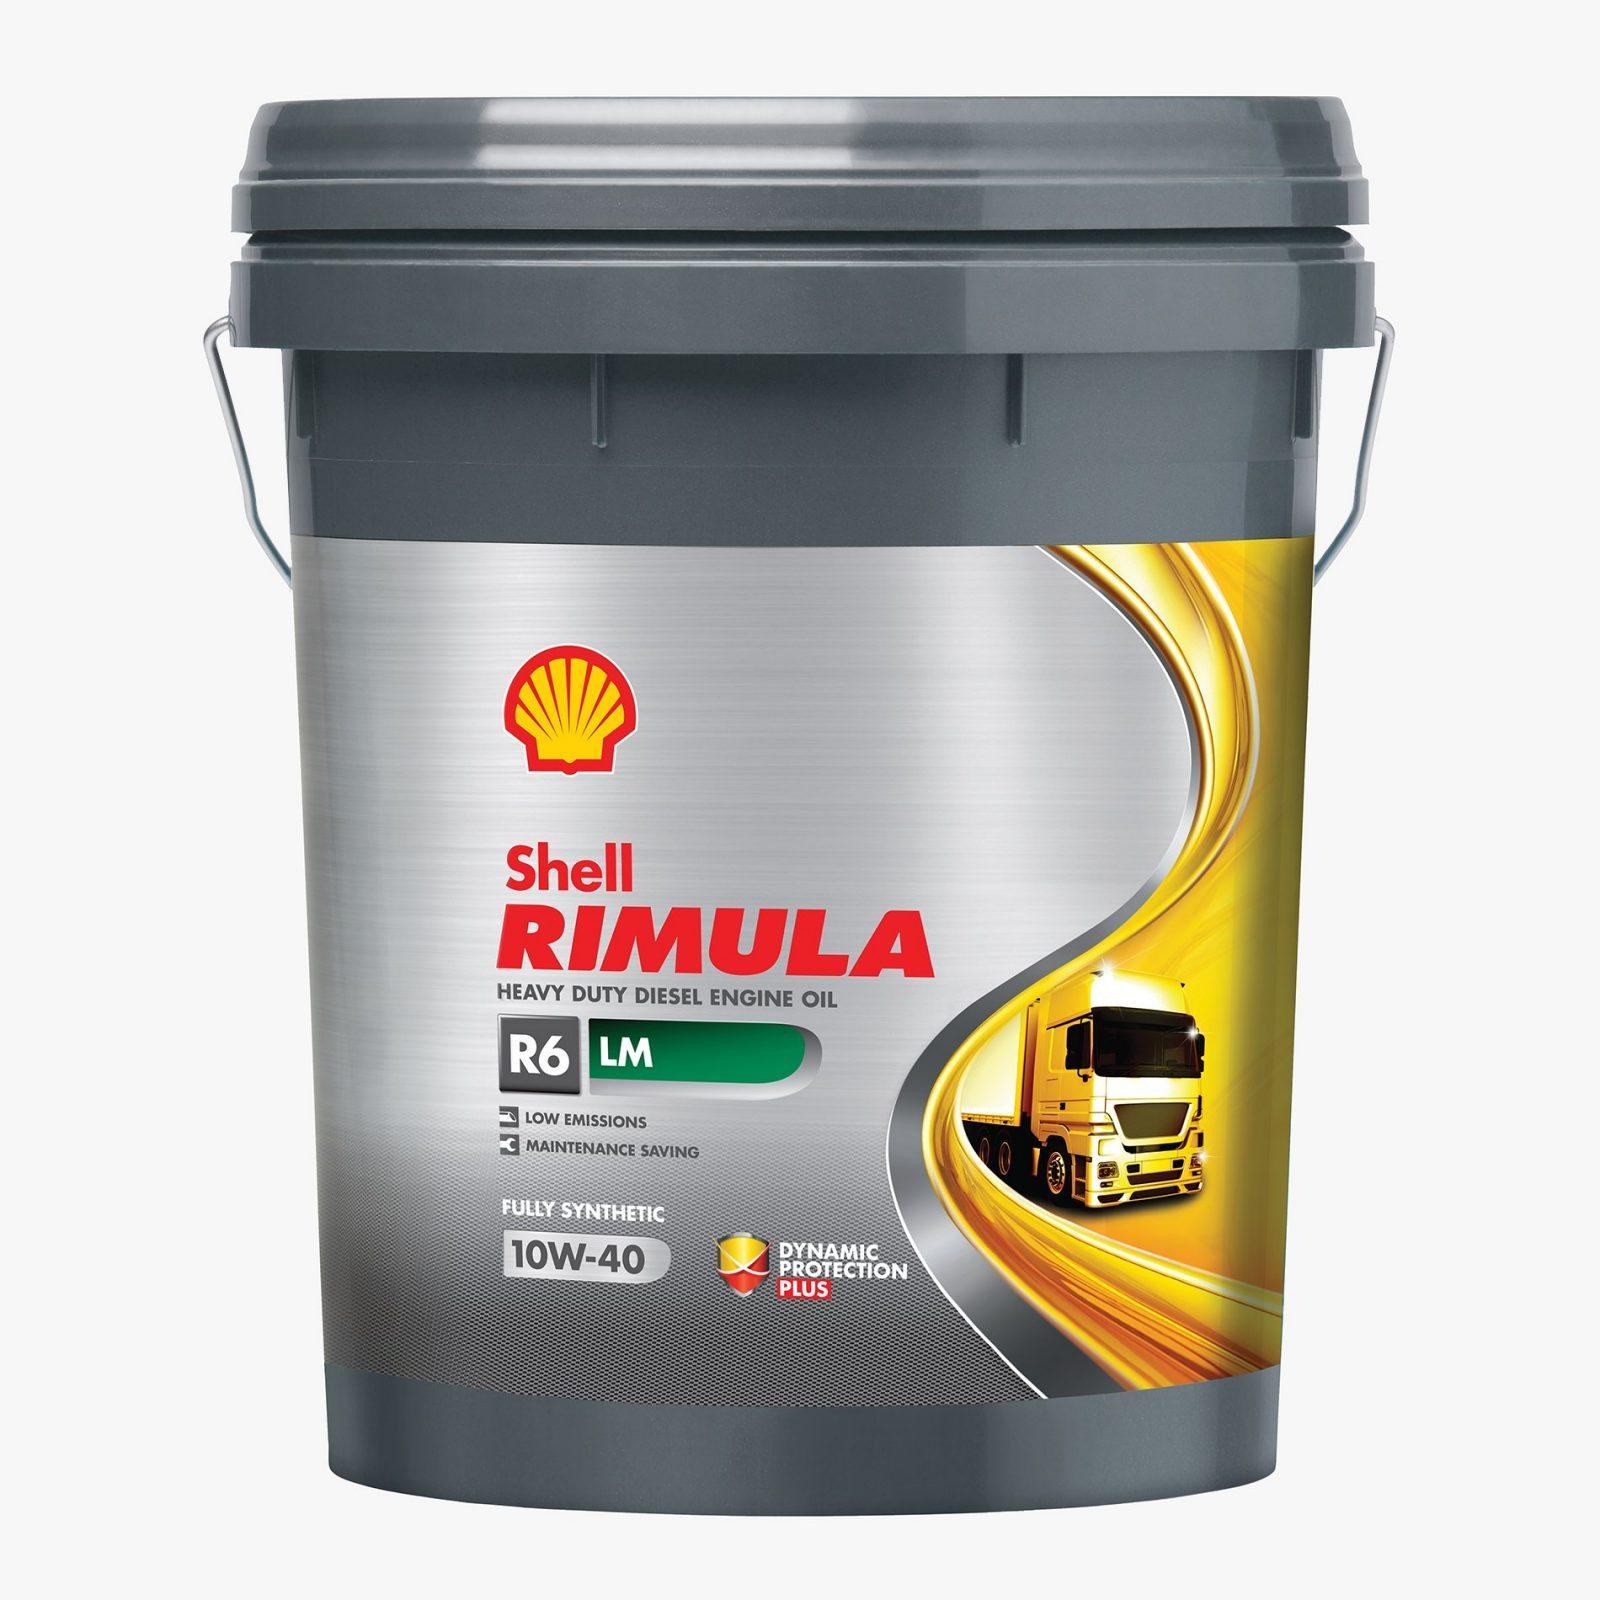 Shell Rimula R6 LM